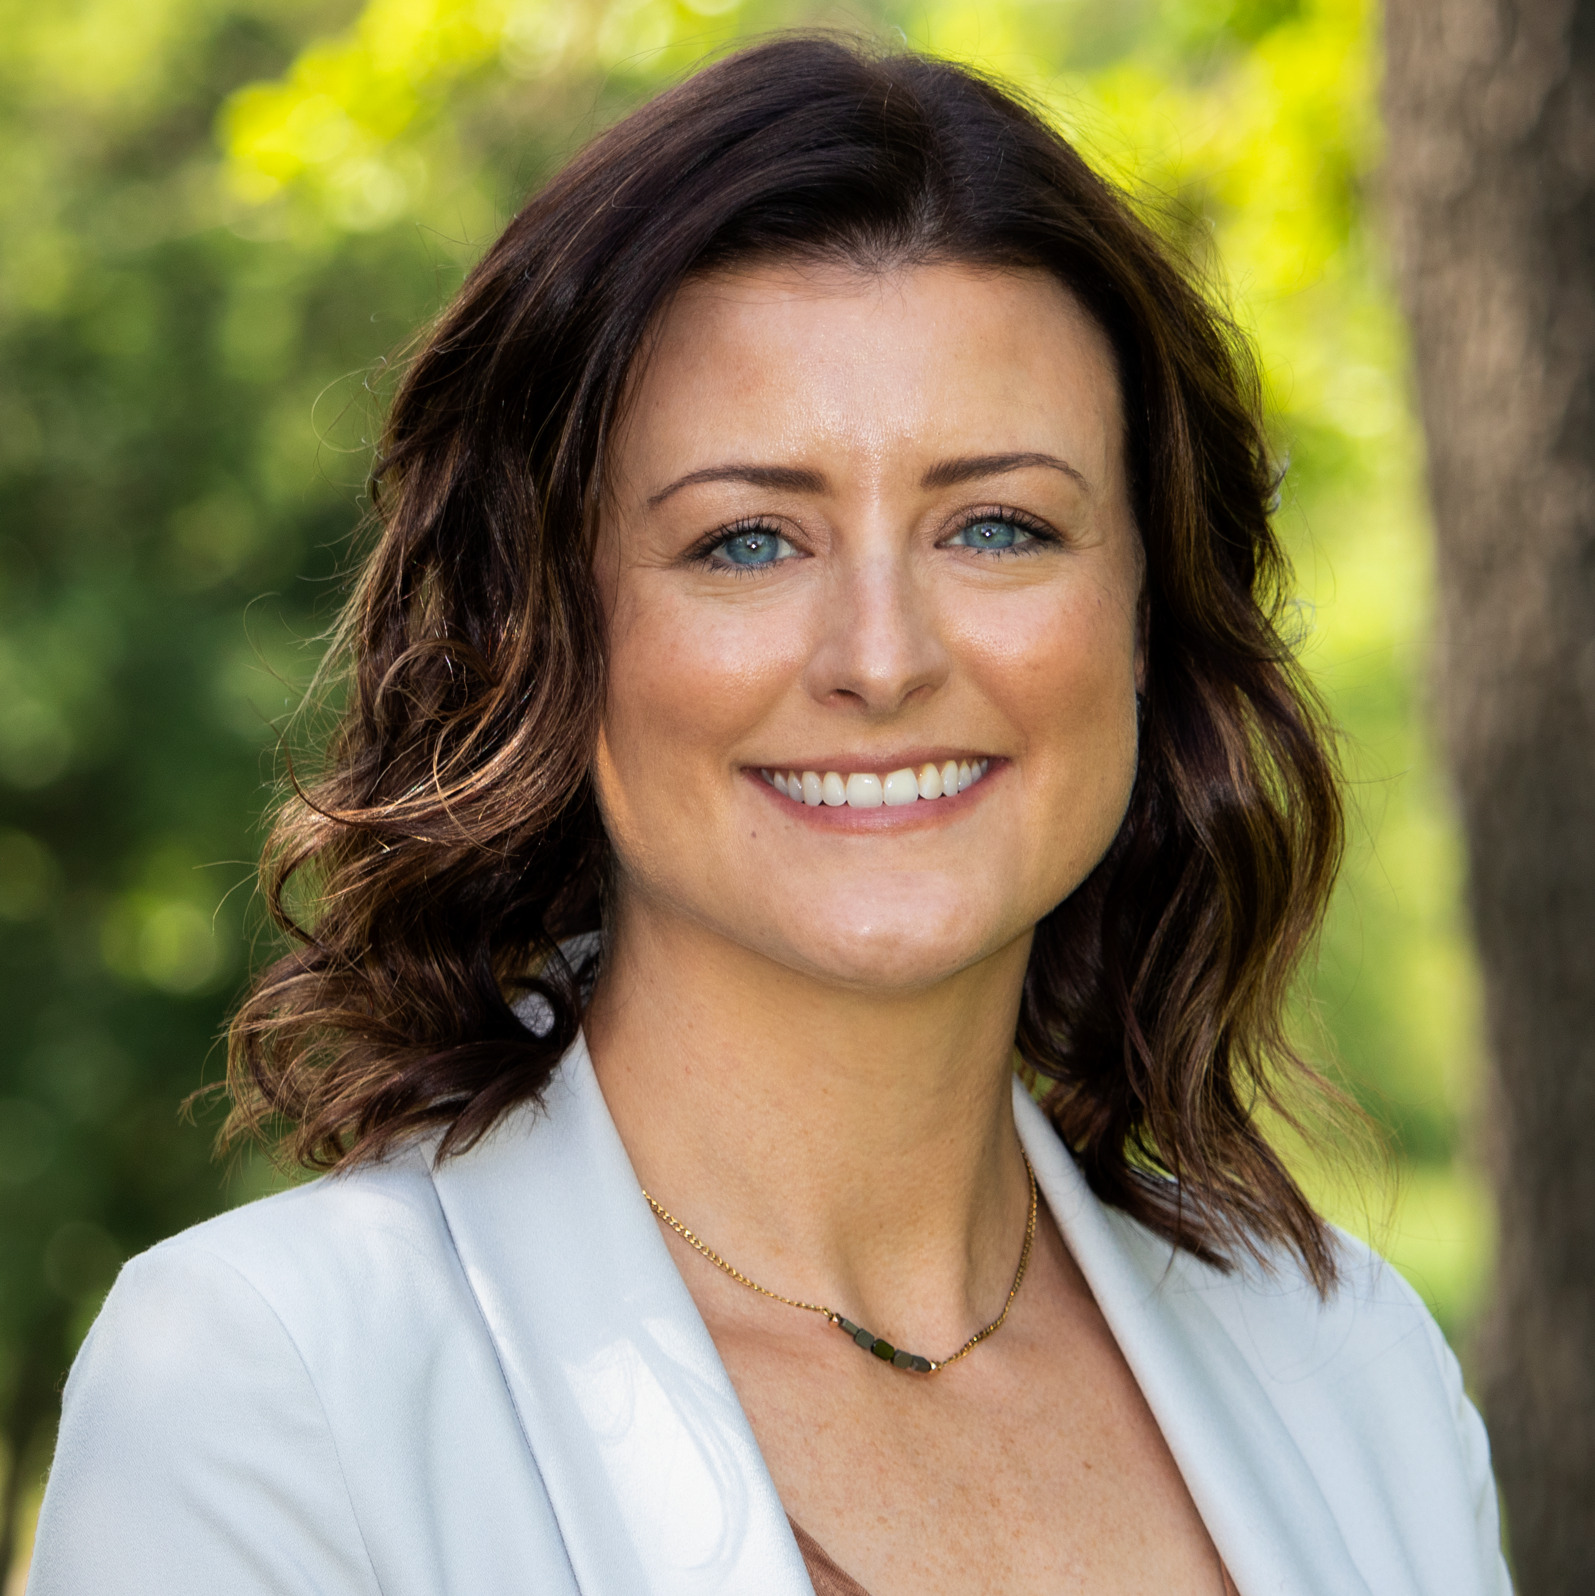 Profile photo of Cassandra Steiger S